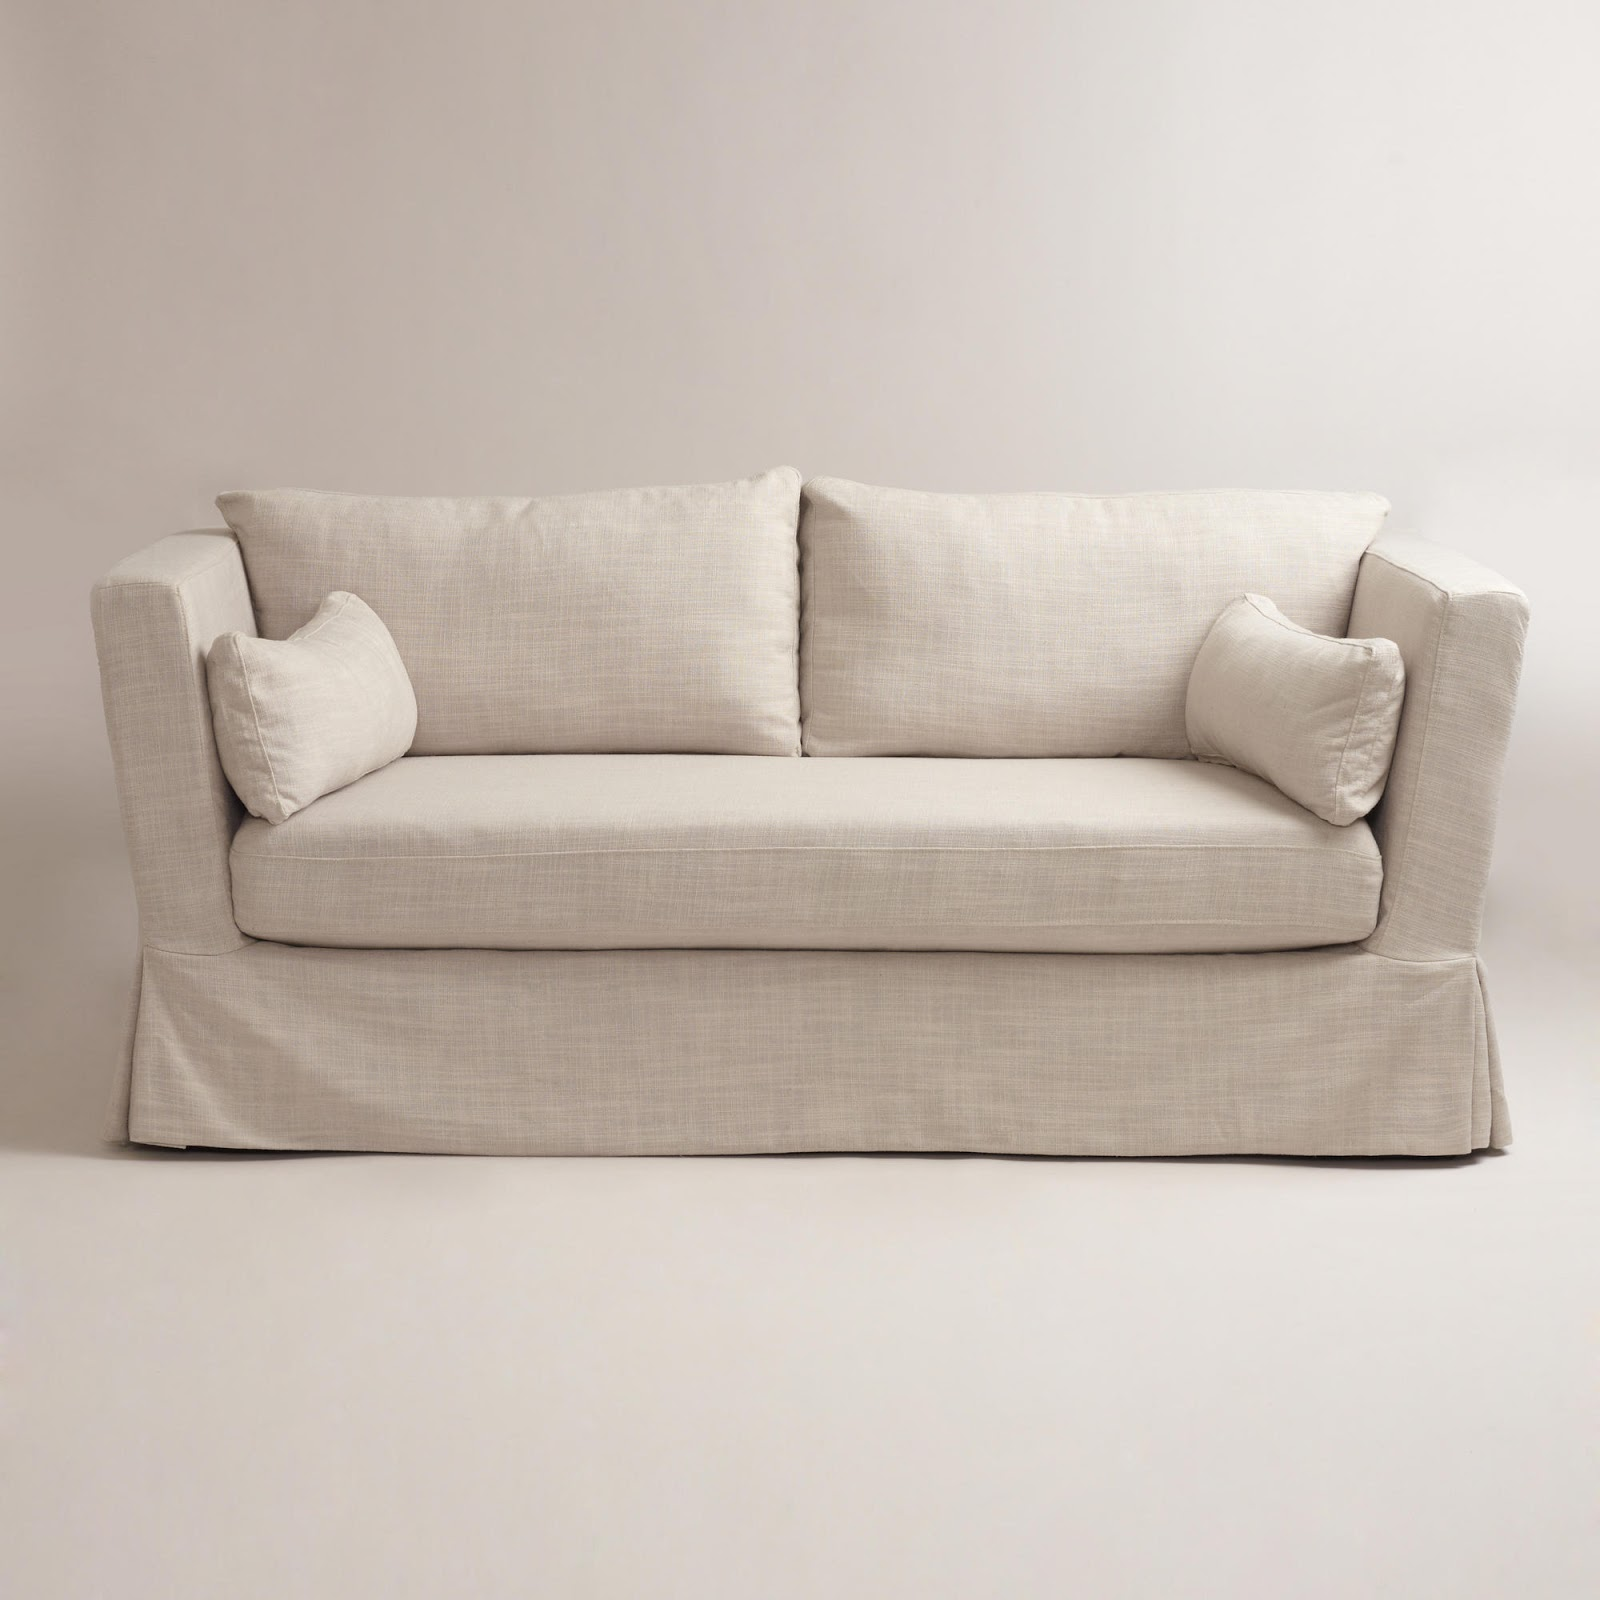 Restoration Hardware Belgian Shelter Arm Slipcovered Sofa